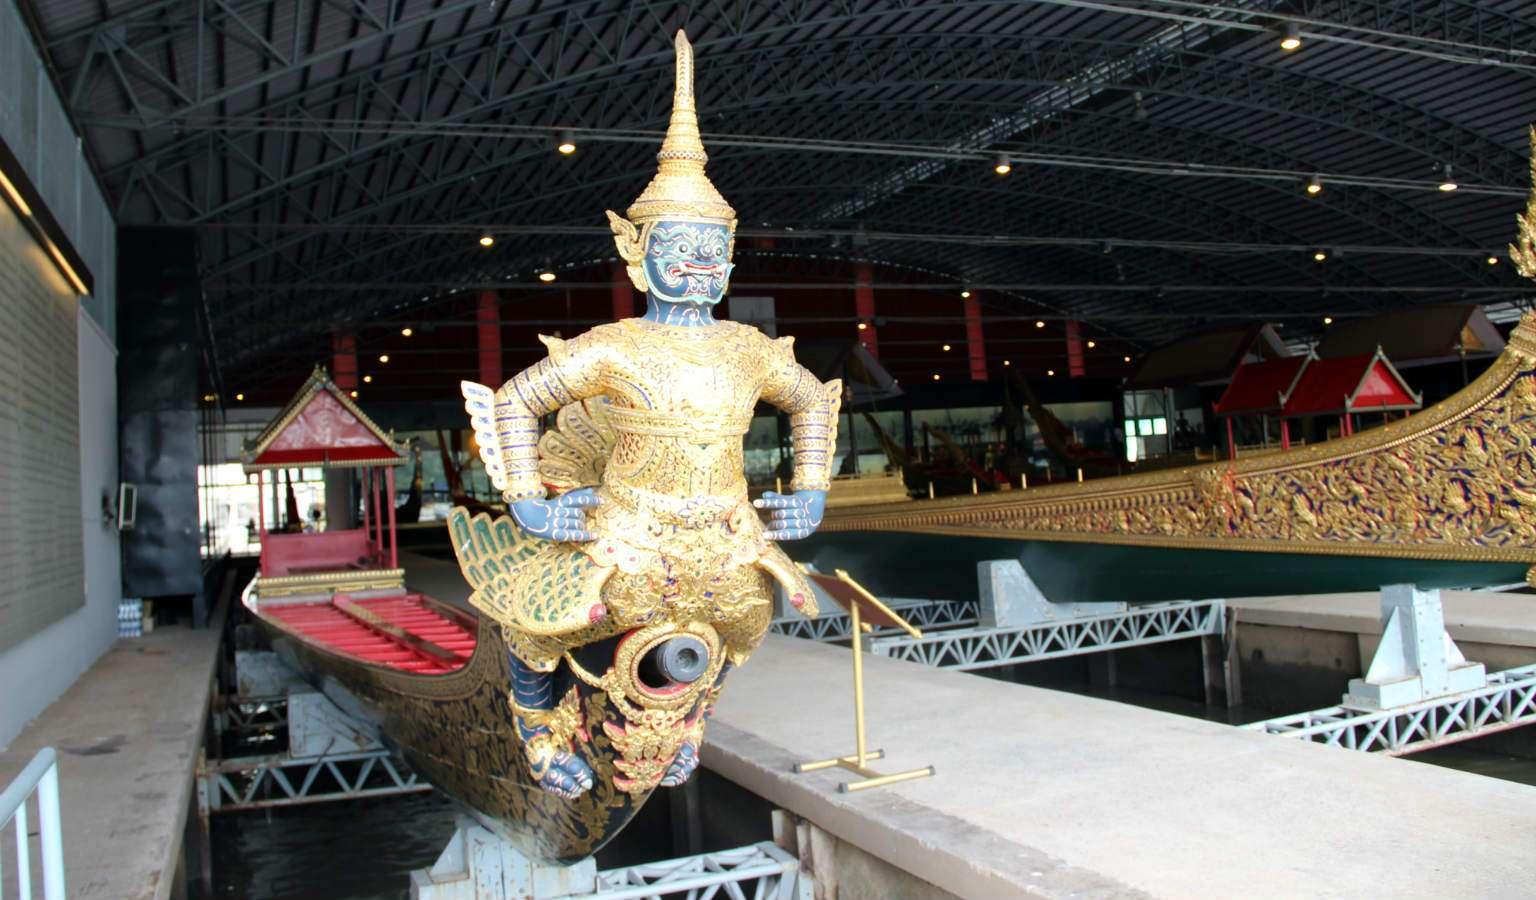 The royal barge of Asurawayupak in the National Museum of Royal Barges in Bangkok